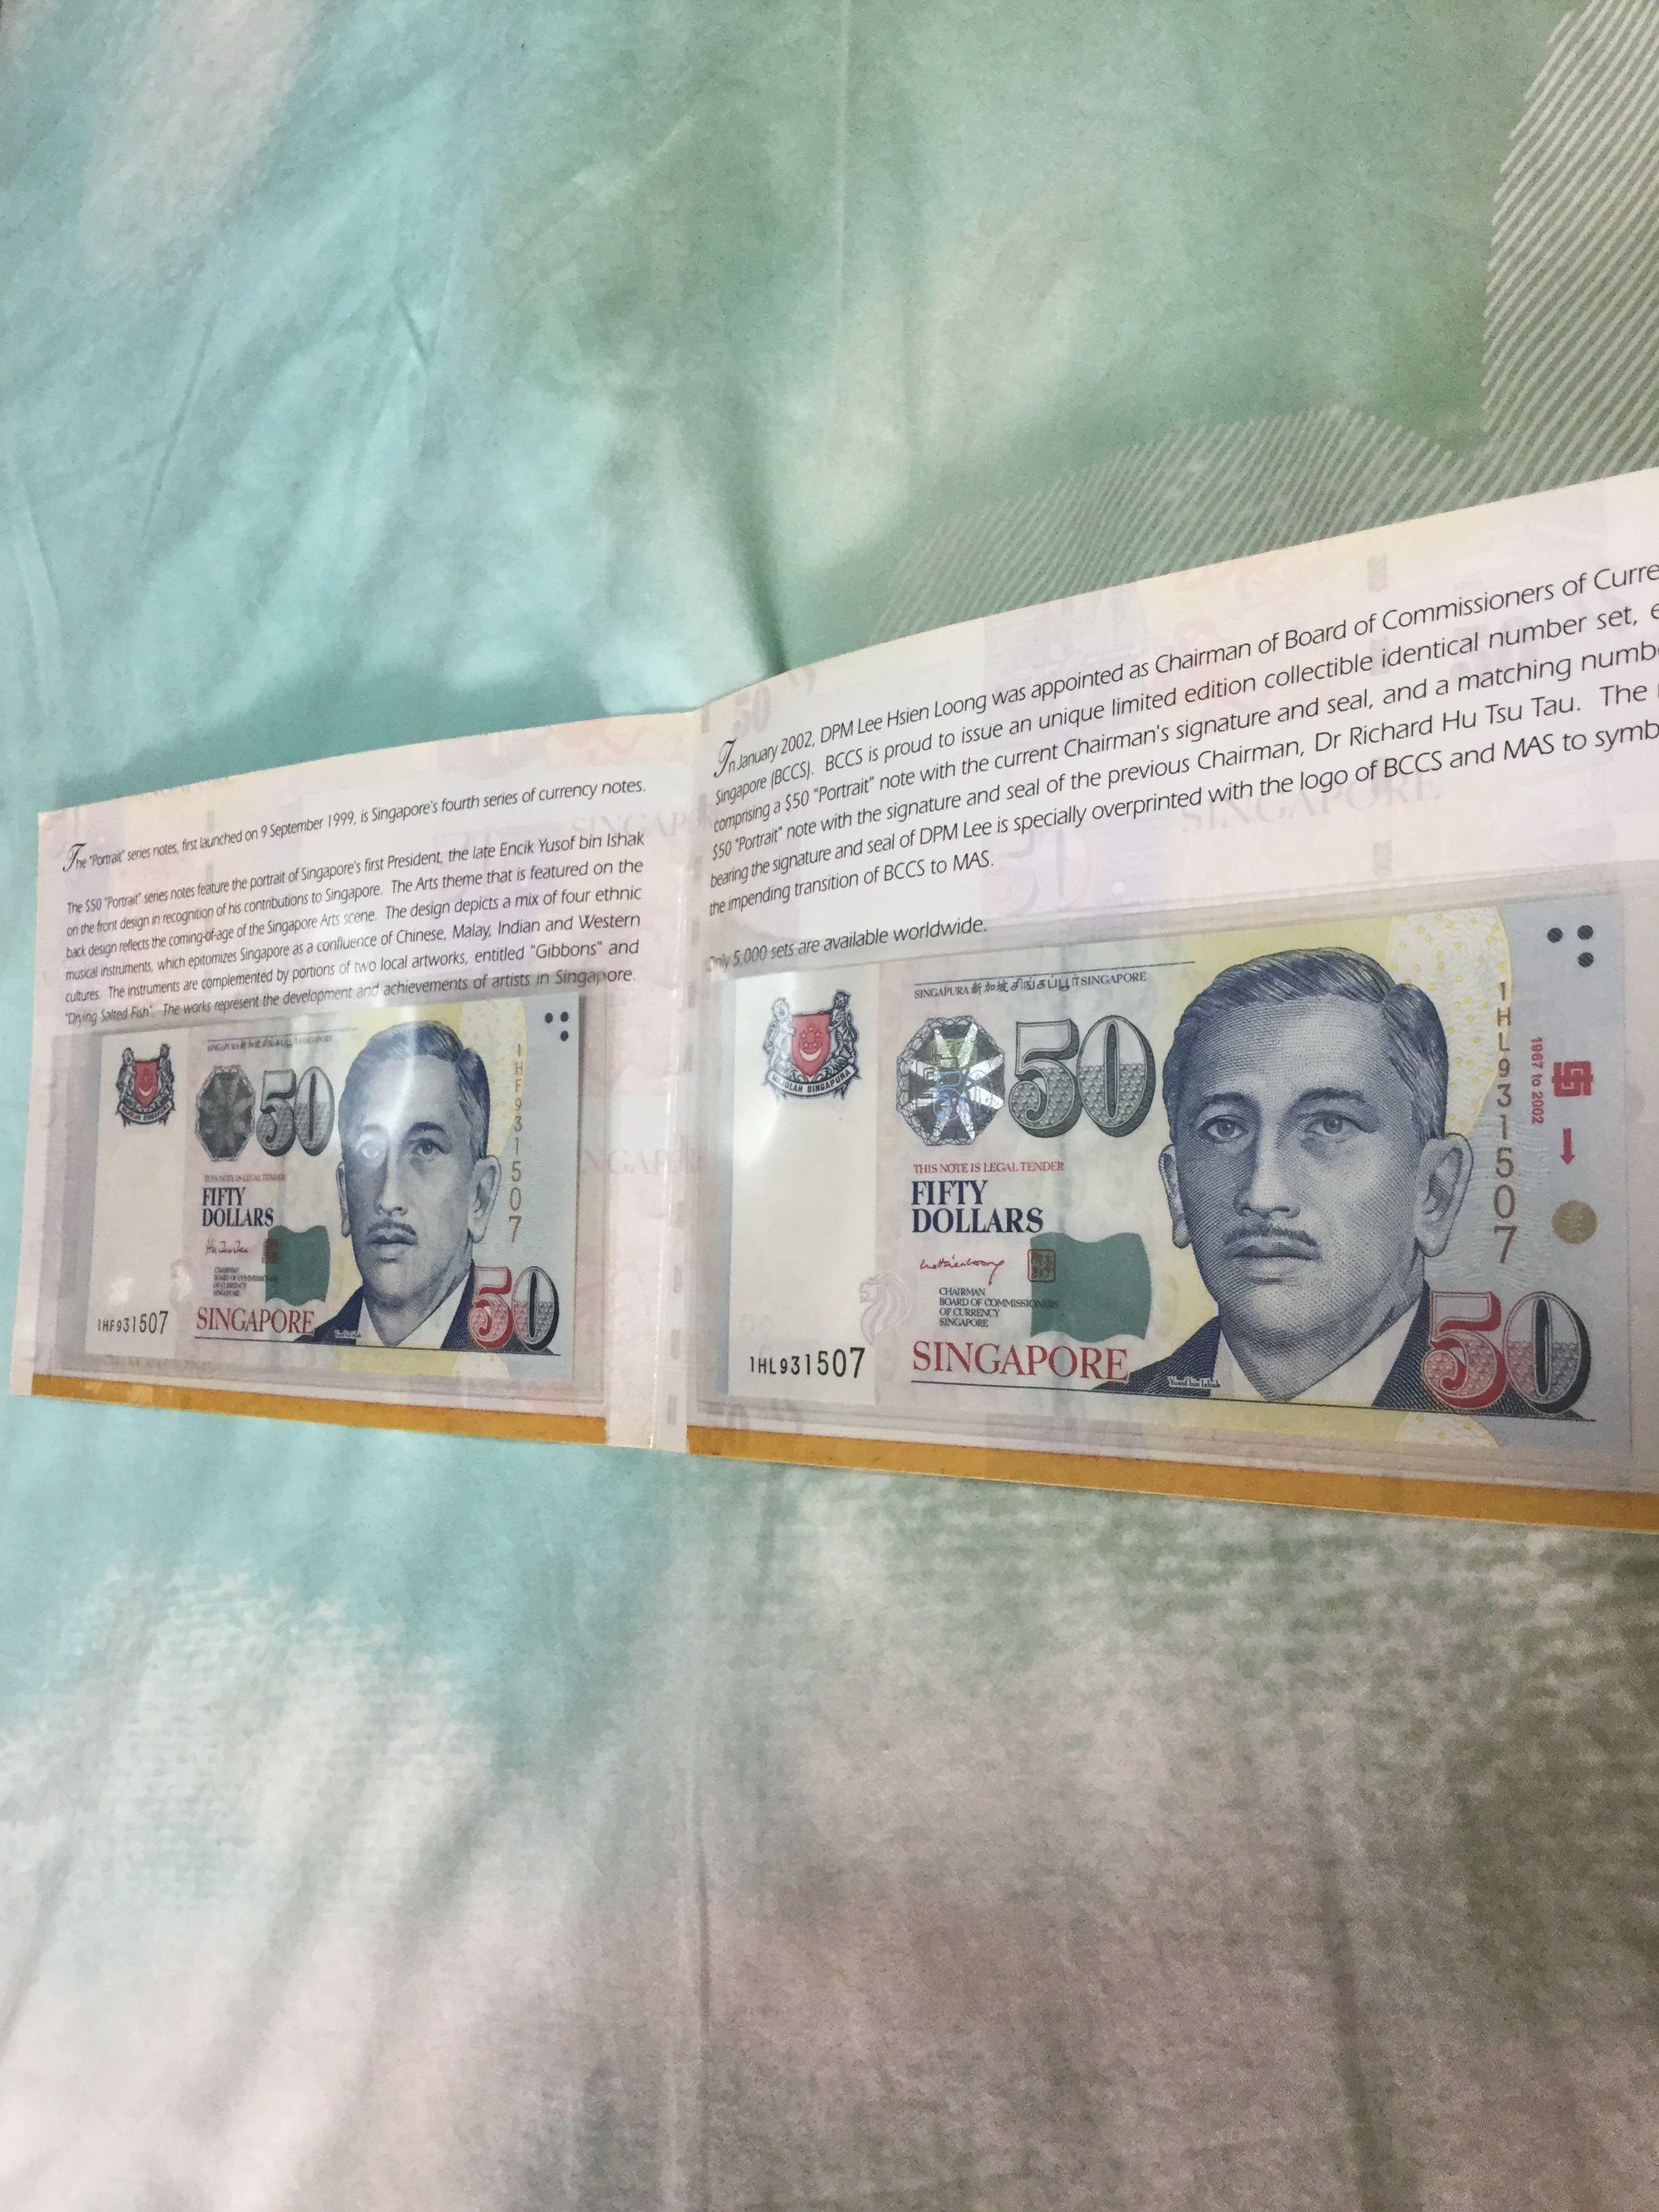 SINGAPORE 50 DOLLARS 2002 BCCS TO MAS COMMEMORATIVE UNC RARE MONEY BANK NOTE